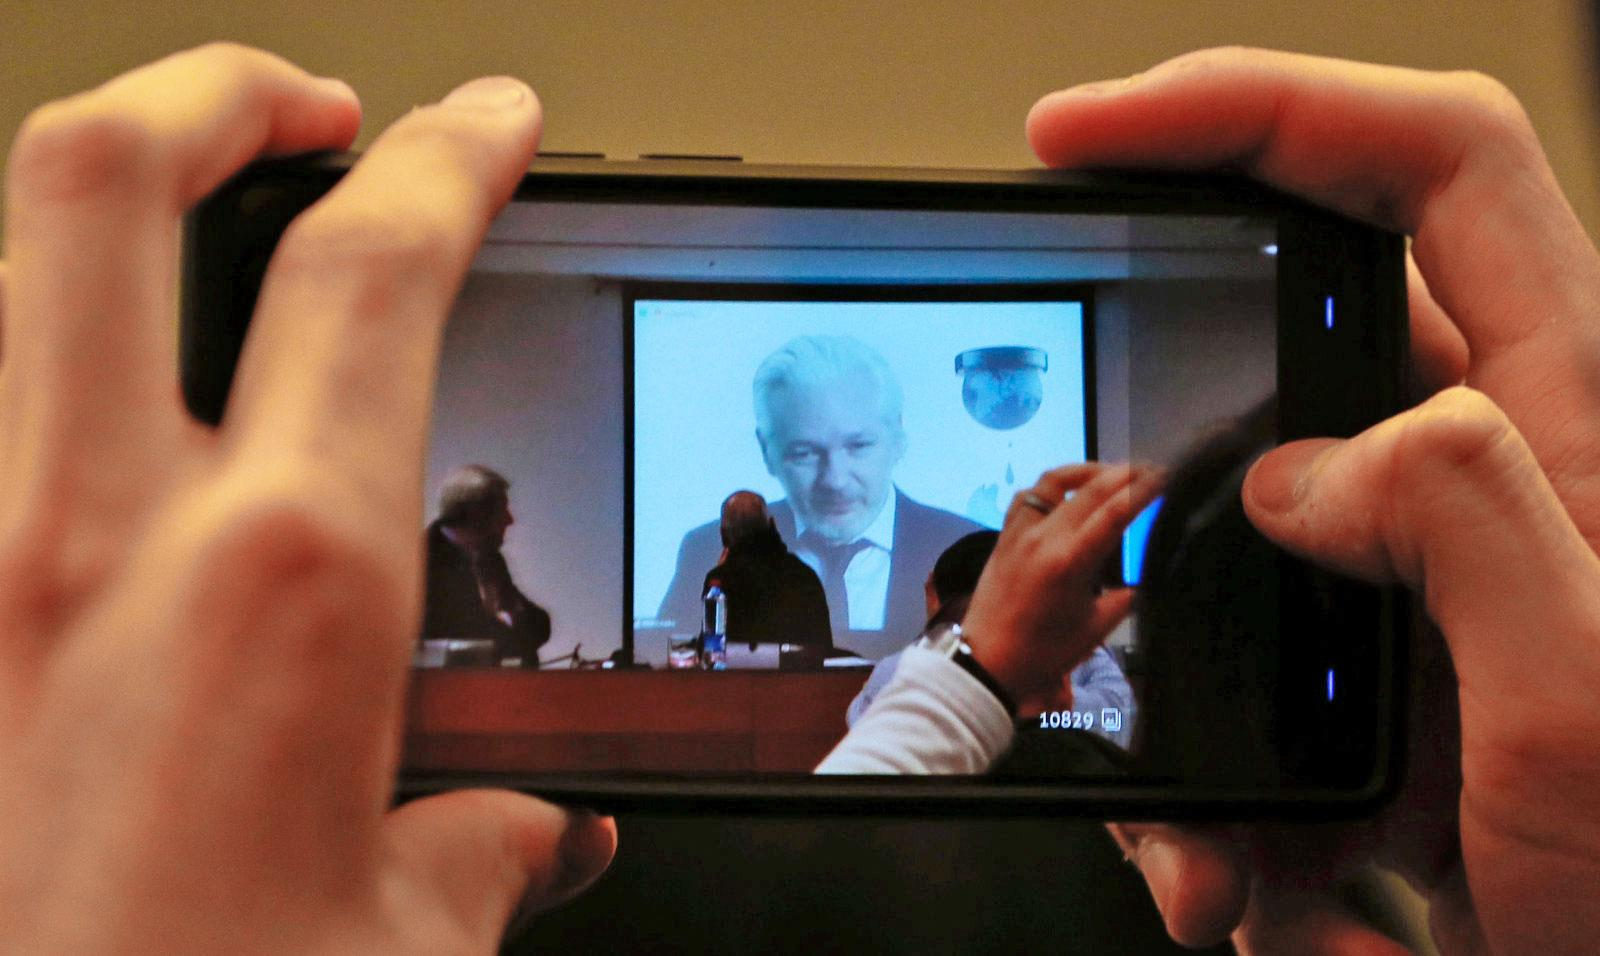 Sweden drops investigation into Julian Assange rape allegations | Engadget